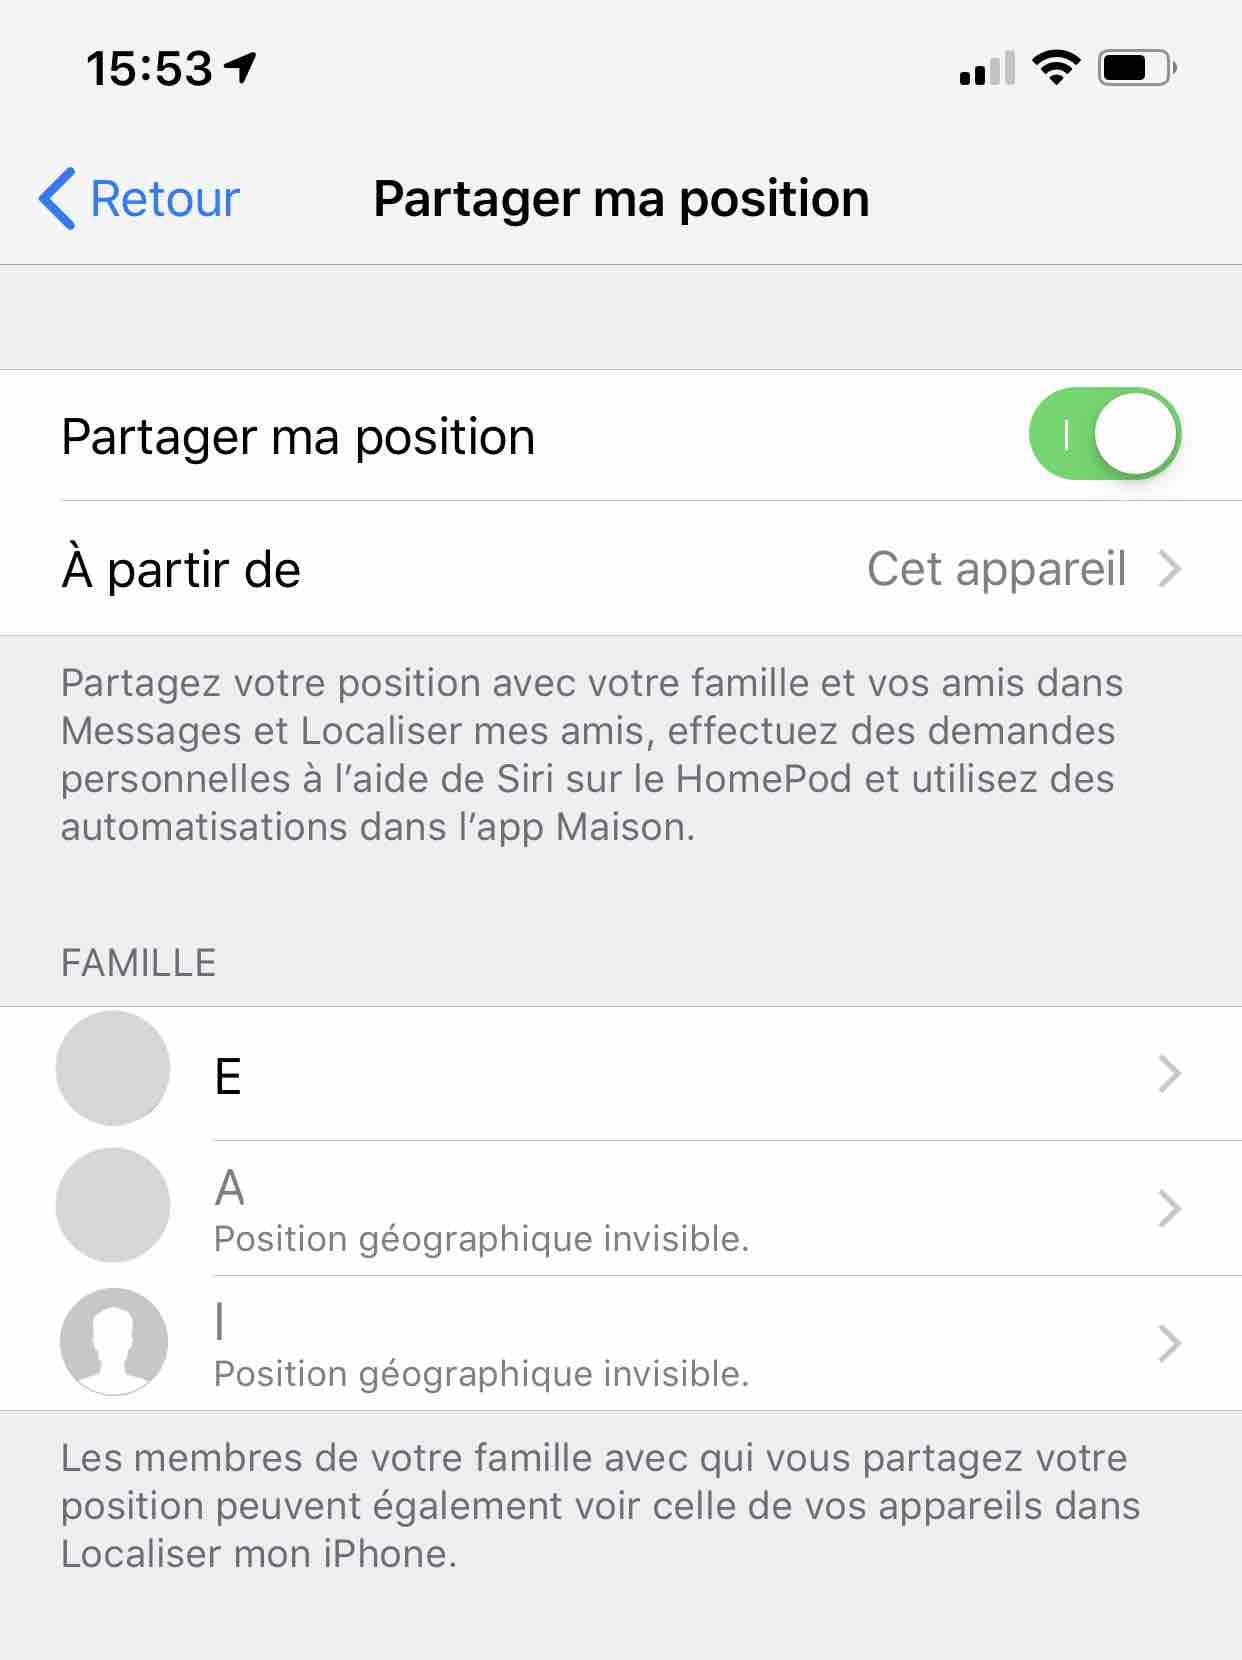 Partager_ma_position_Apple_iCloud_Partage_familial_iOS_Cplusclaire.jpg